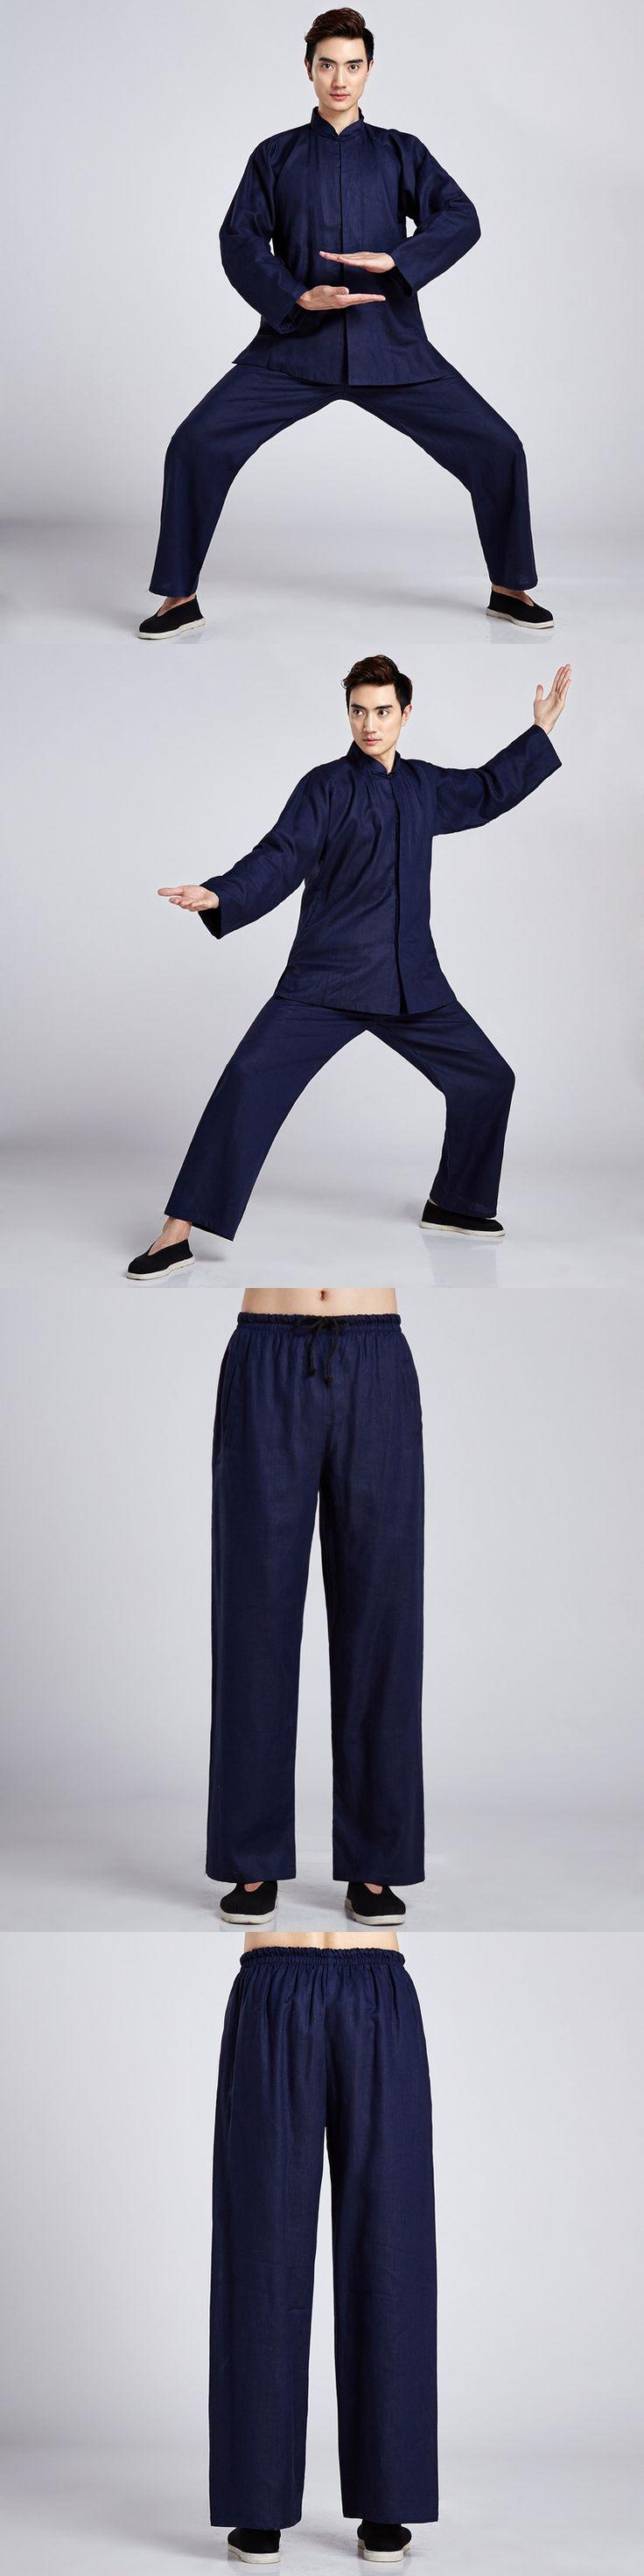 New Navy Blue Chinese Men's Classic Tai Chi Uniform Cotton Linen Kung fu Suit Clothing Size M L XL XXL XXXL 2516